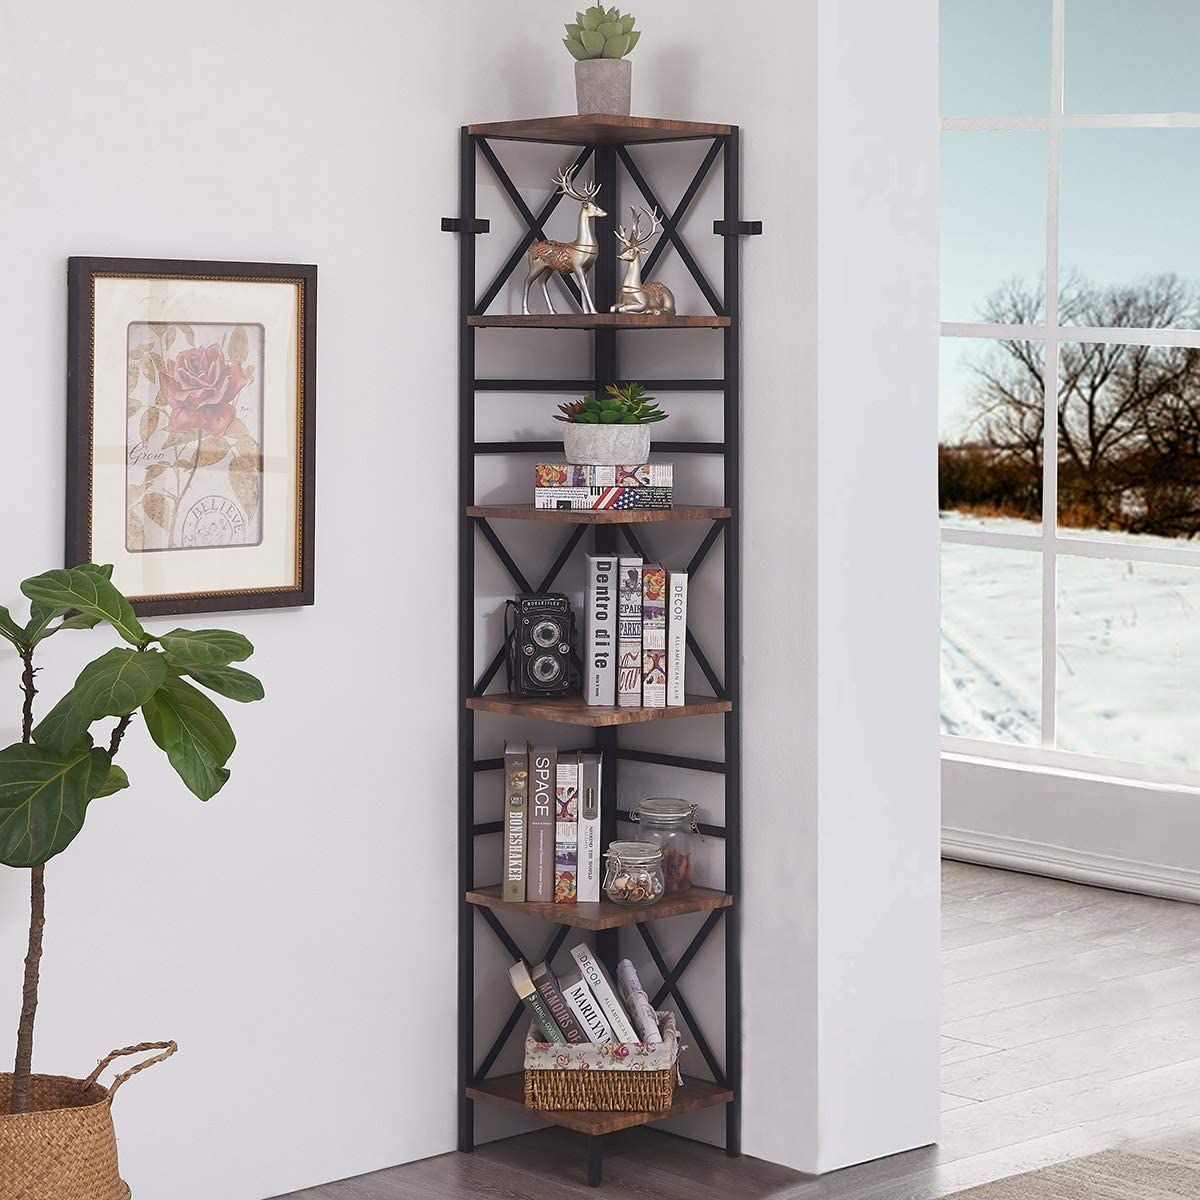 6 Tier Industrial Corner Shelf Unit Tall Bookcase Storage Etsy In 2021 Corner Shelf Unit Corner Bookshelves Bookcase Storage